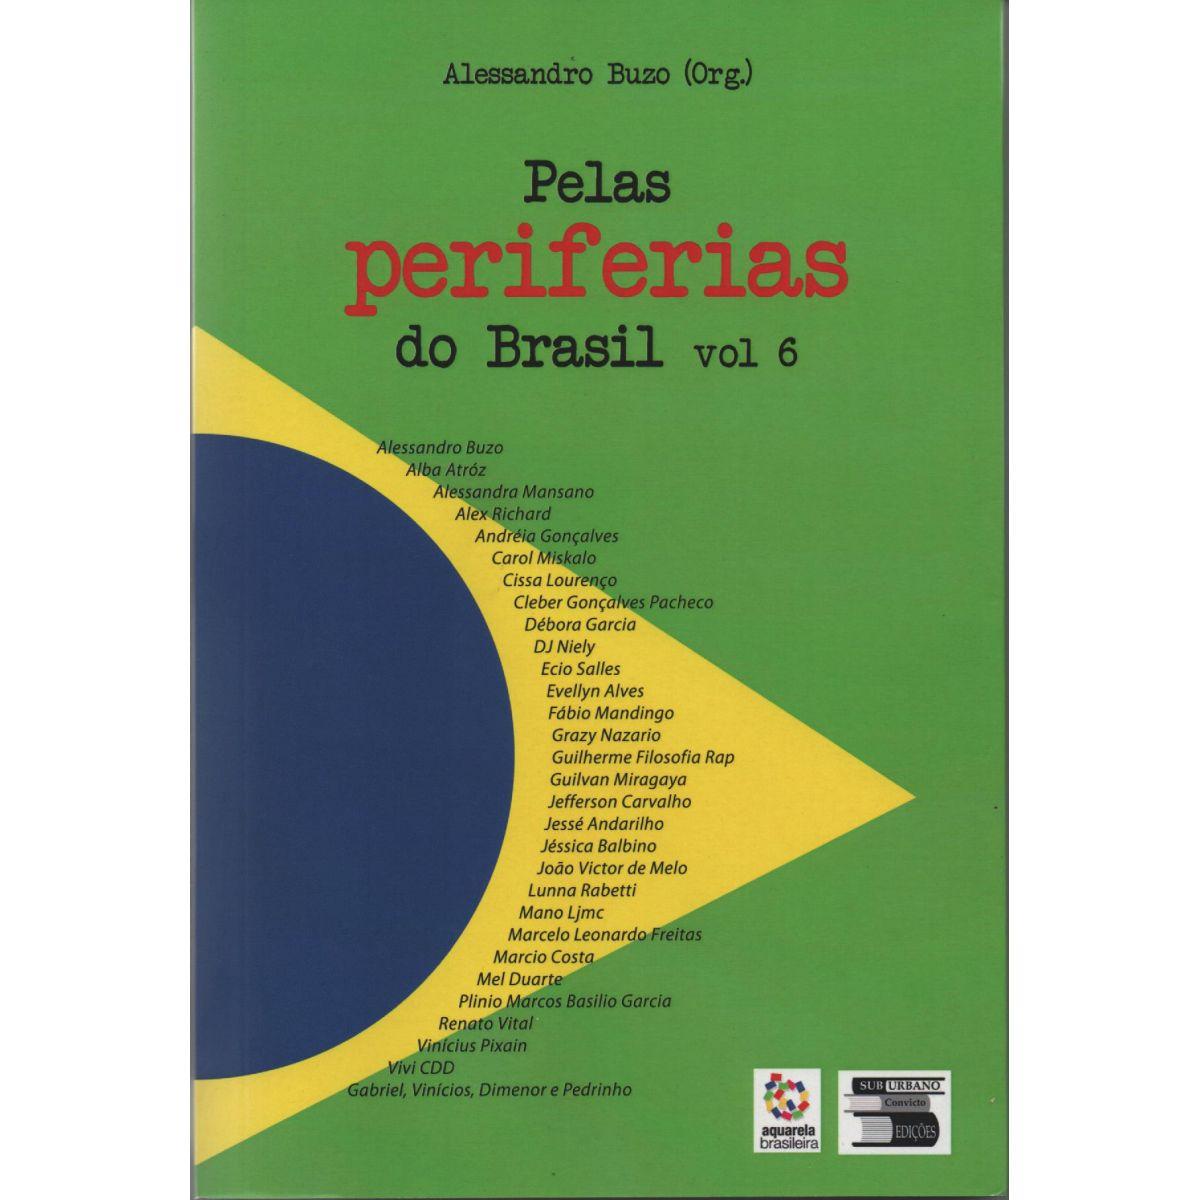 Pelas Periferias do Brasil Vl.6